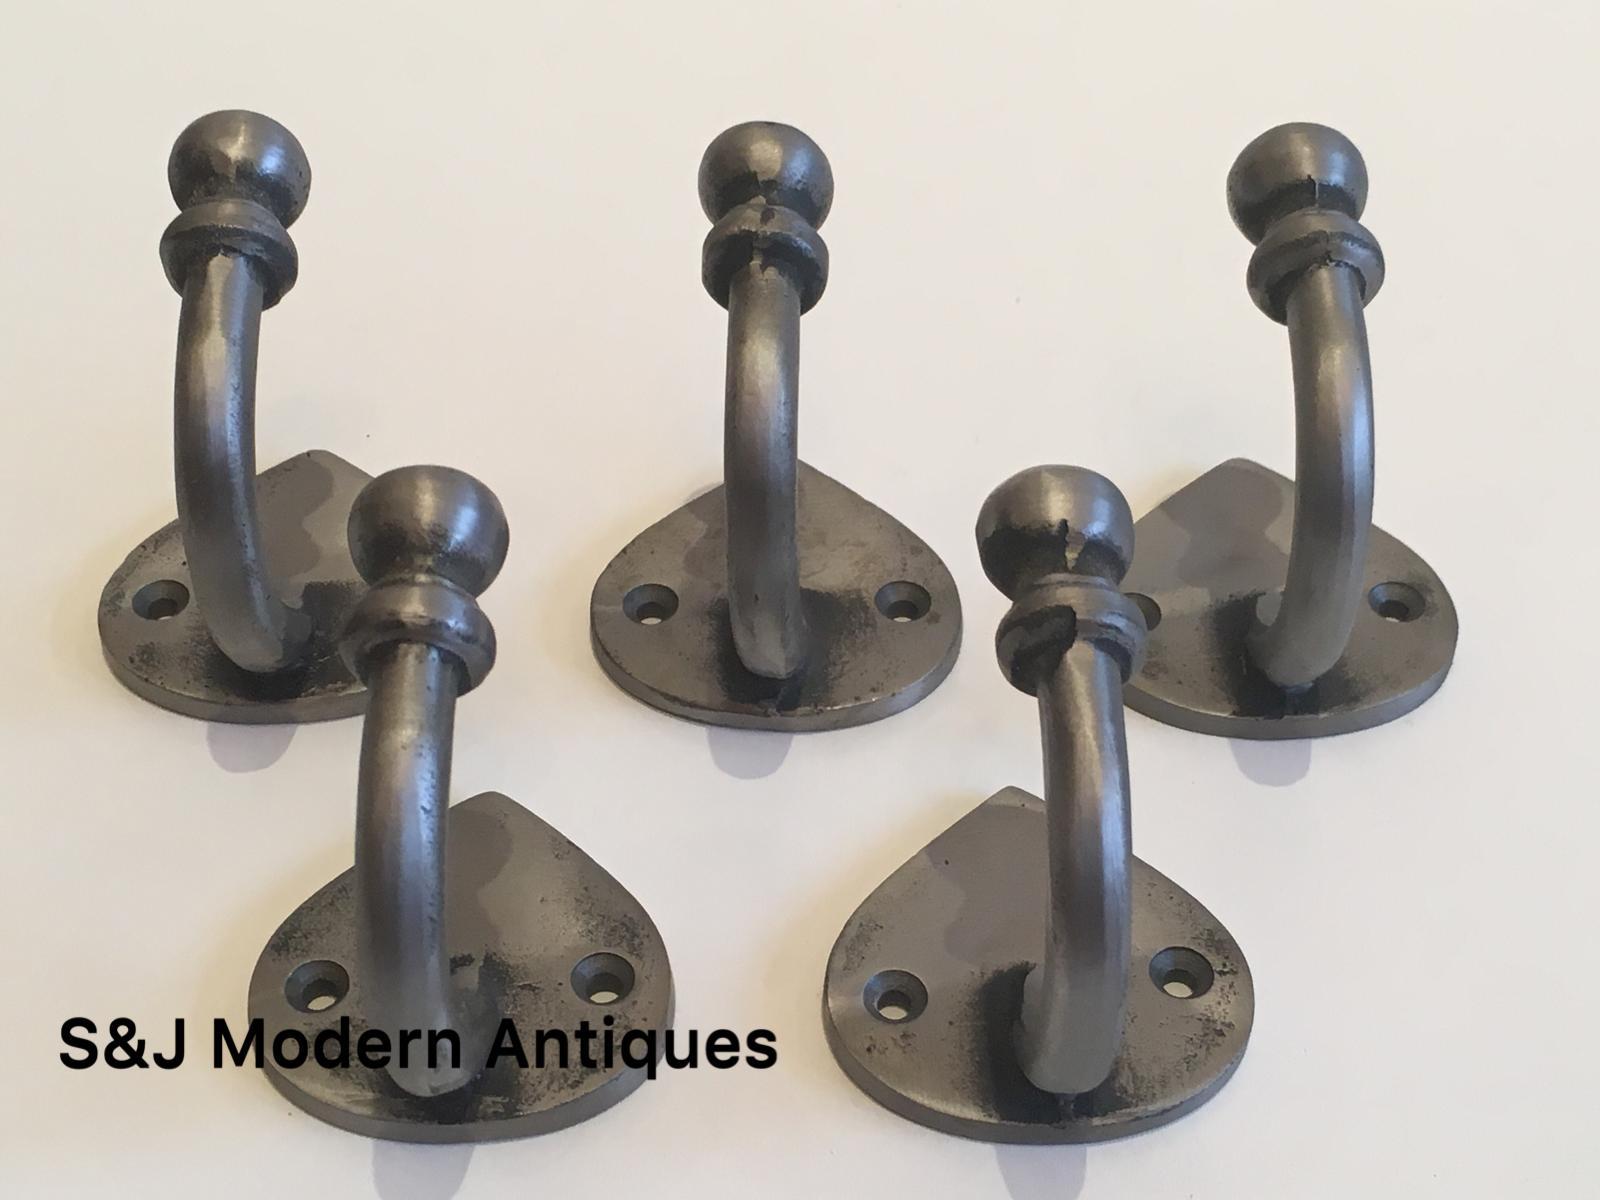 Single Coat Hook Iron Antique Modern Spearhead Vintage Black Grey Hat Rack Set 5 8